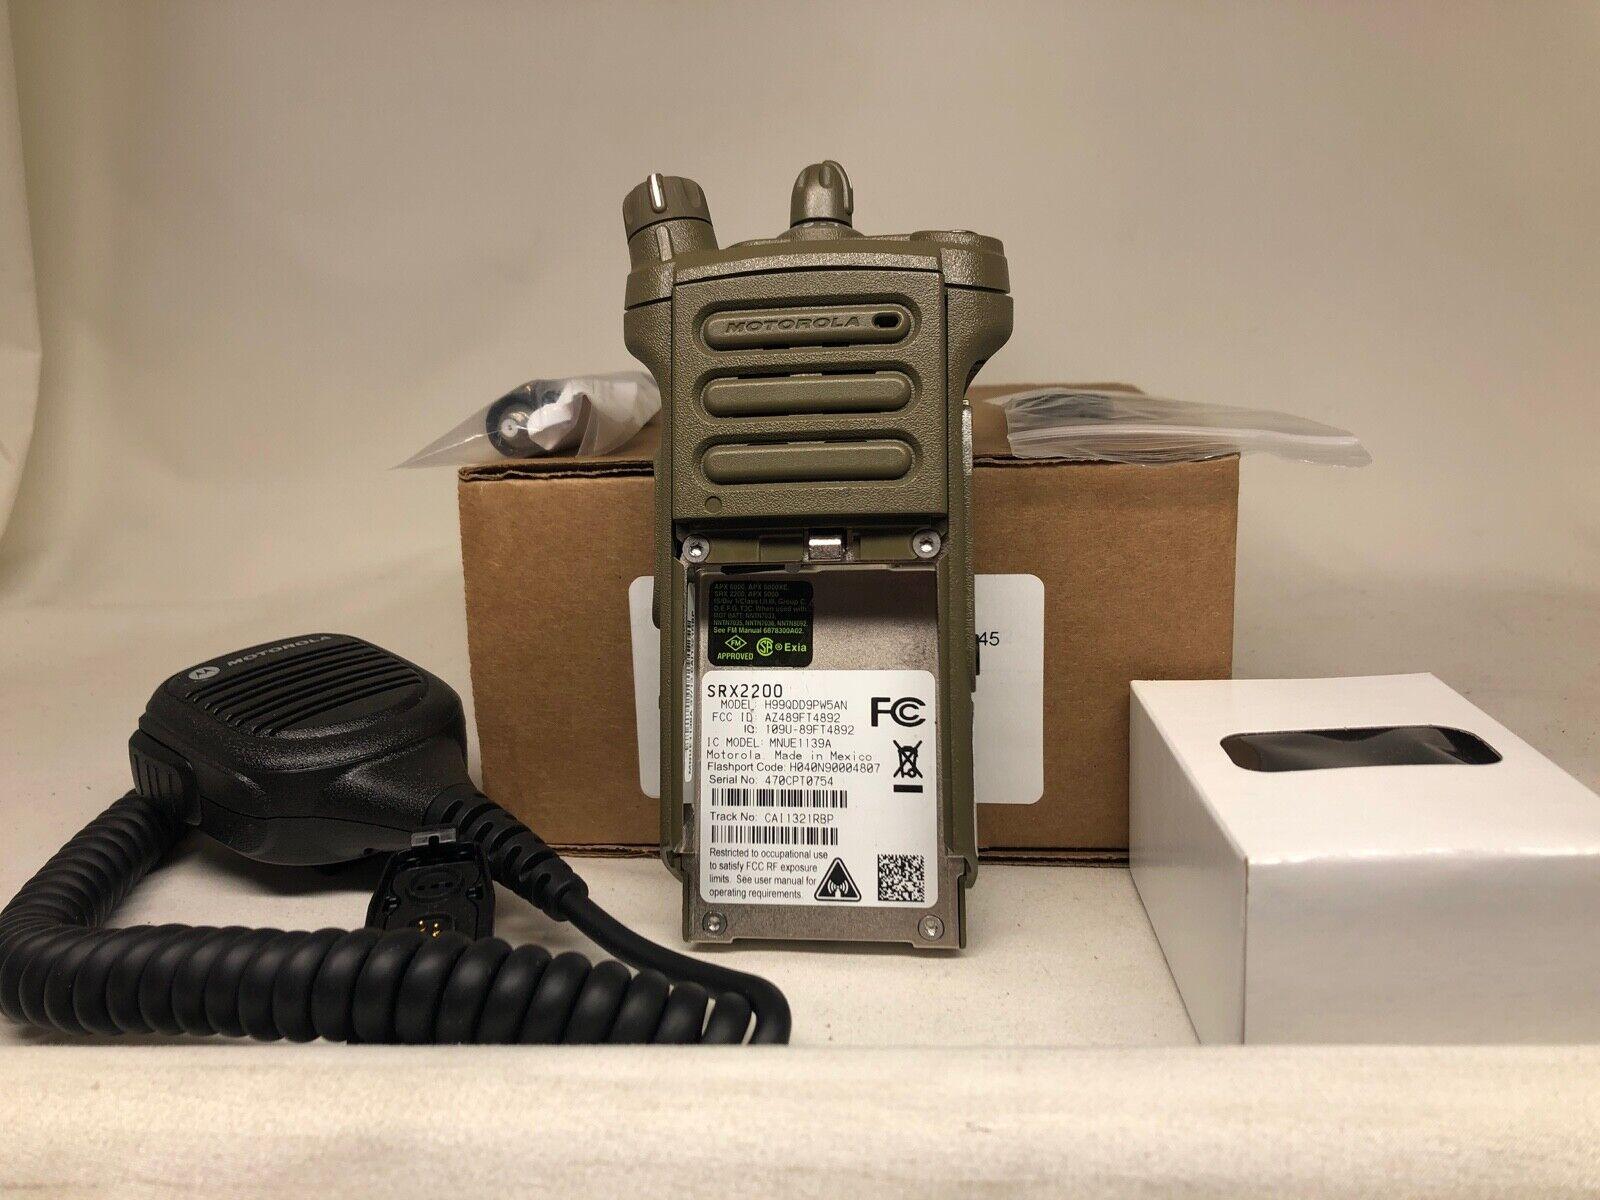 NEW RADIO: MOTOROLA SRX2200 MDL 1.5 UHF 380-470 MHZ UL/I.S AES256 MILITARY FLASH. Buy it now for 1250.00